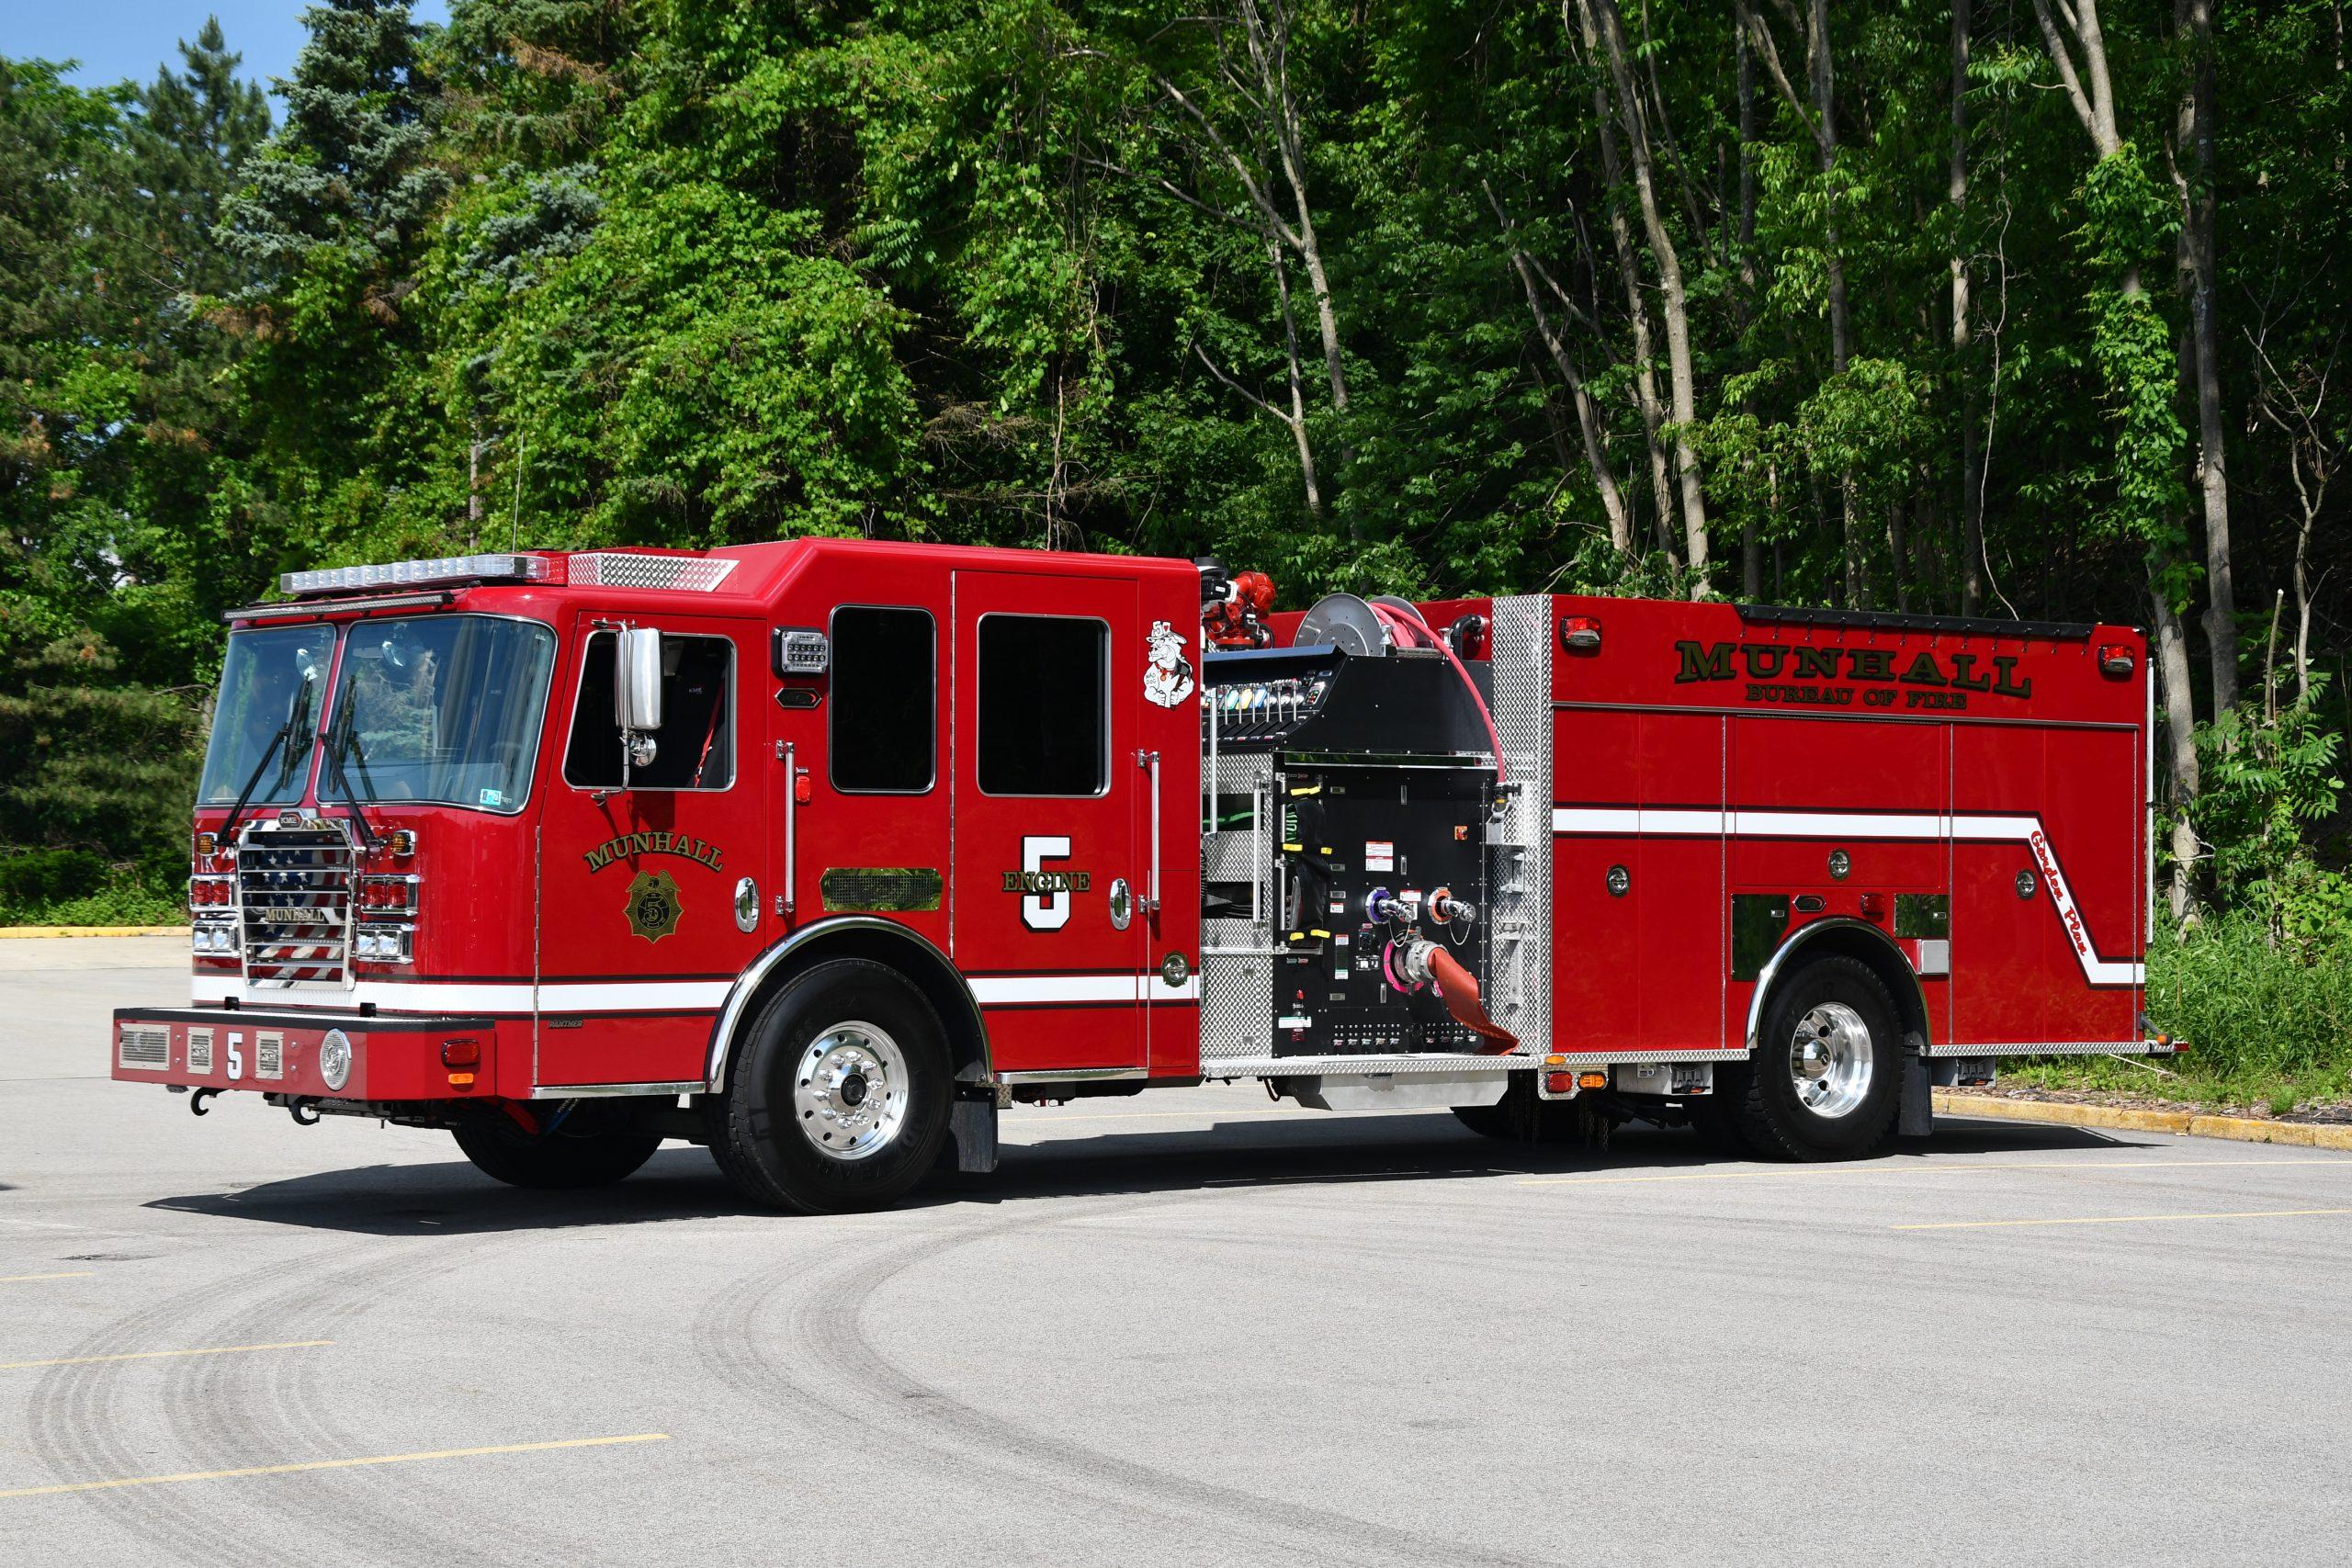 Munhall #5 Volunteer Fire Company, PA